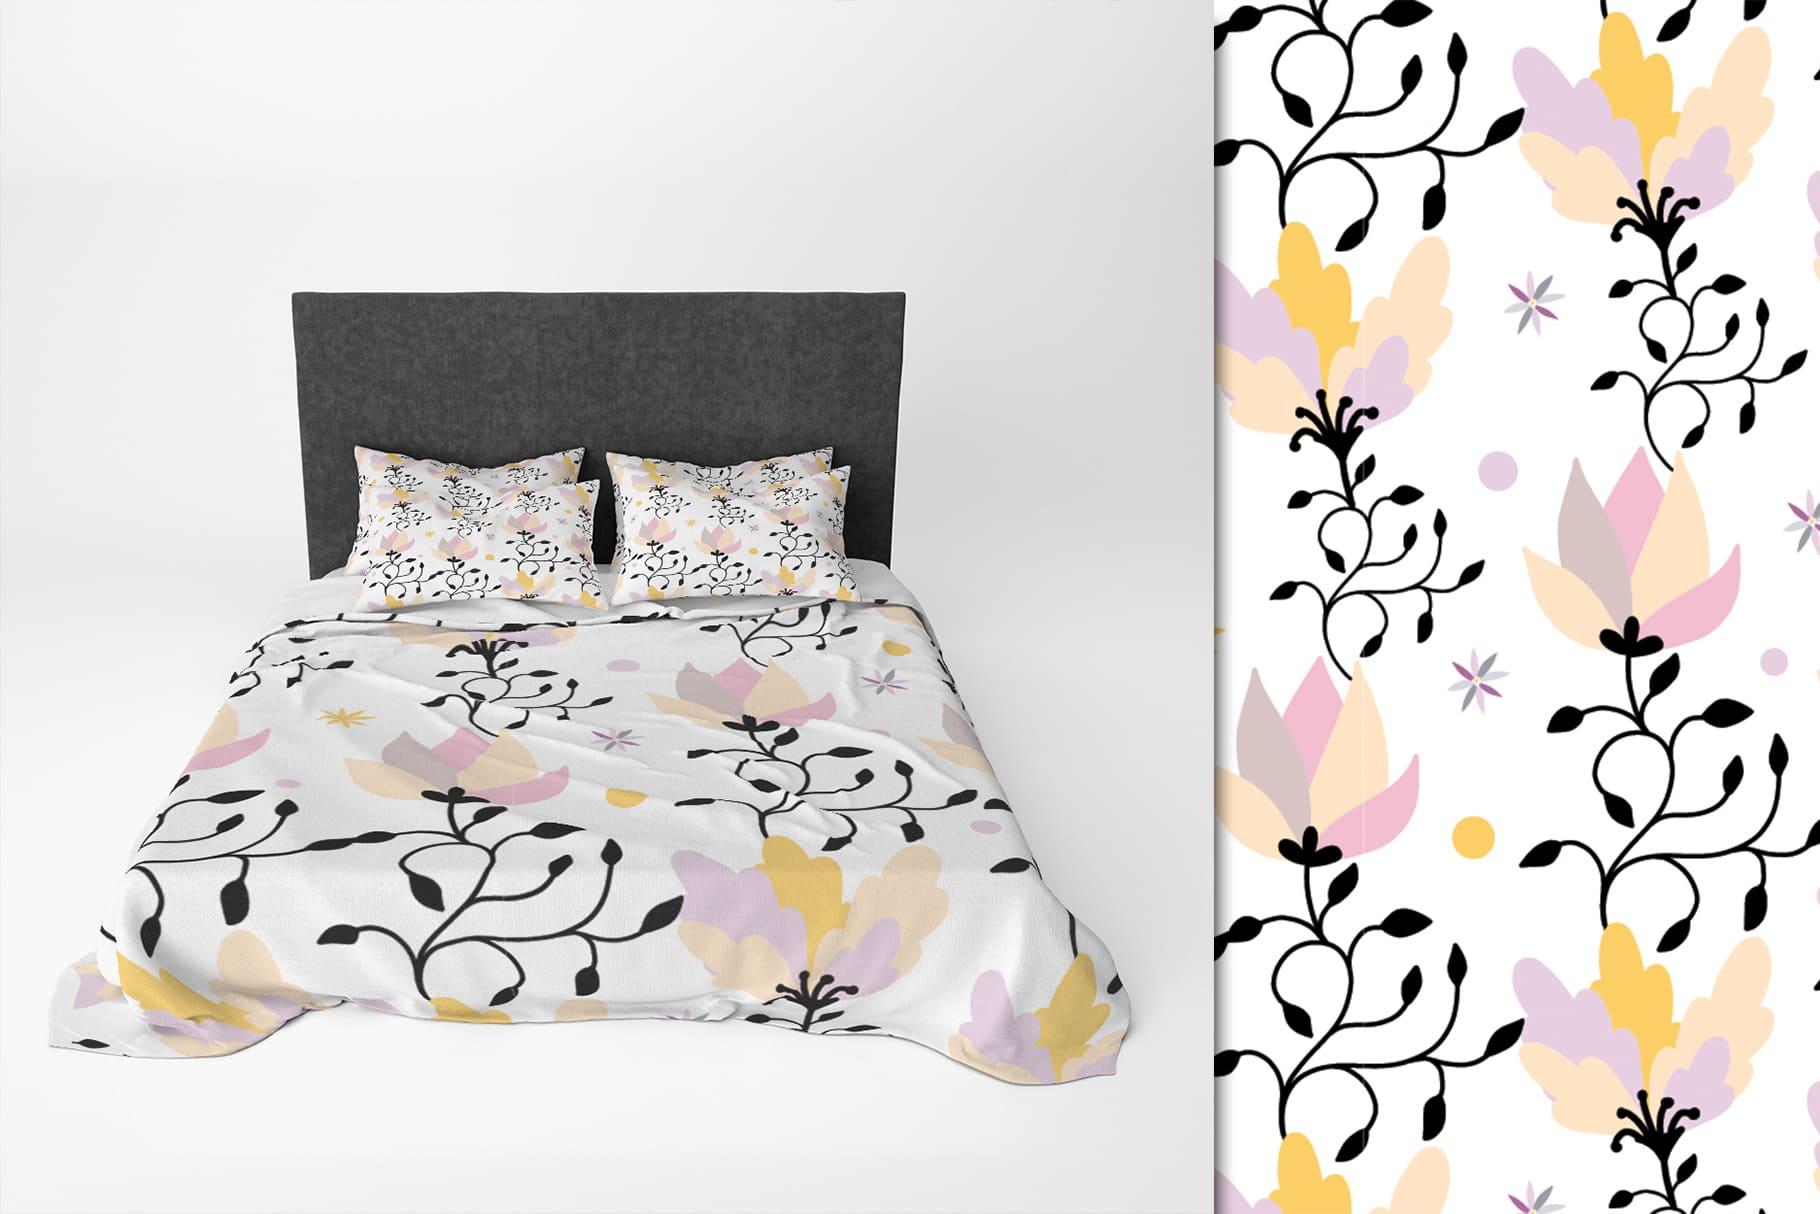 White linens with lotus prints.